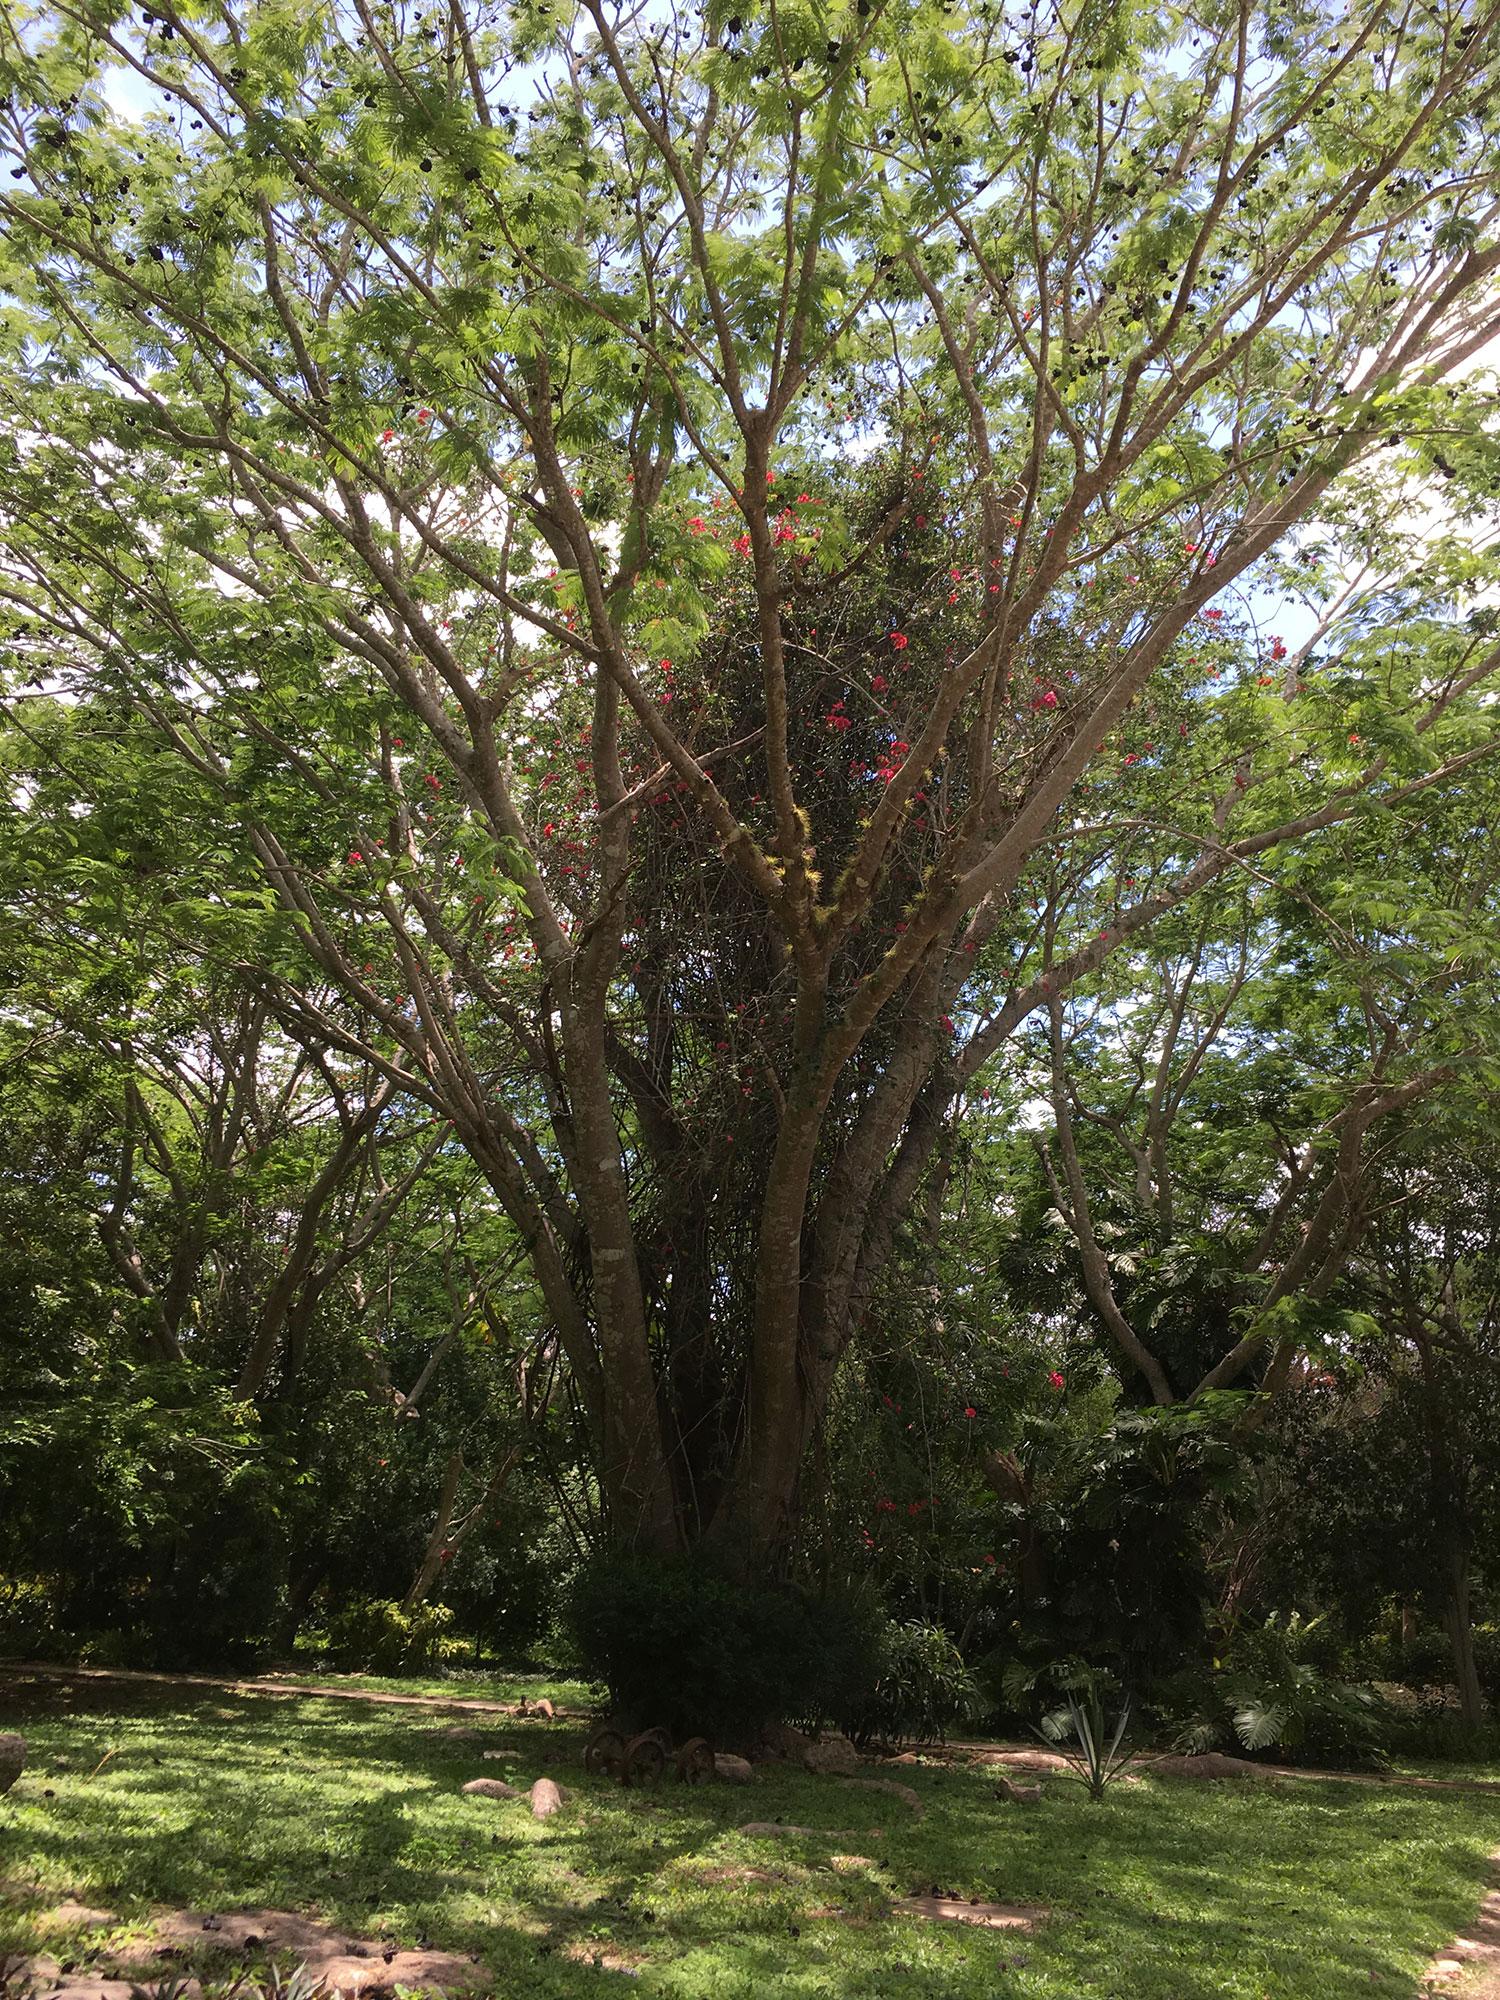 The guanacaste tree (elephant-ear tree).